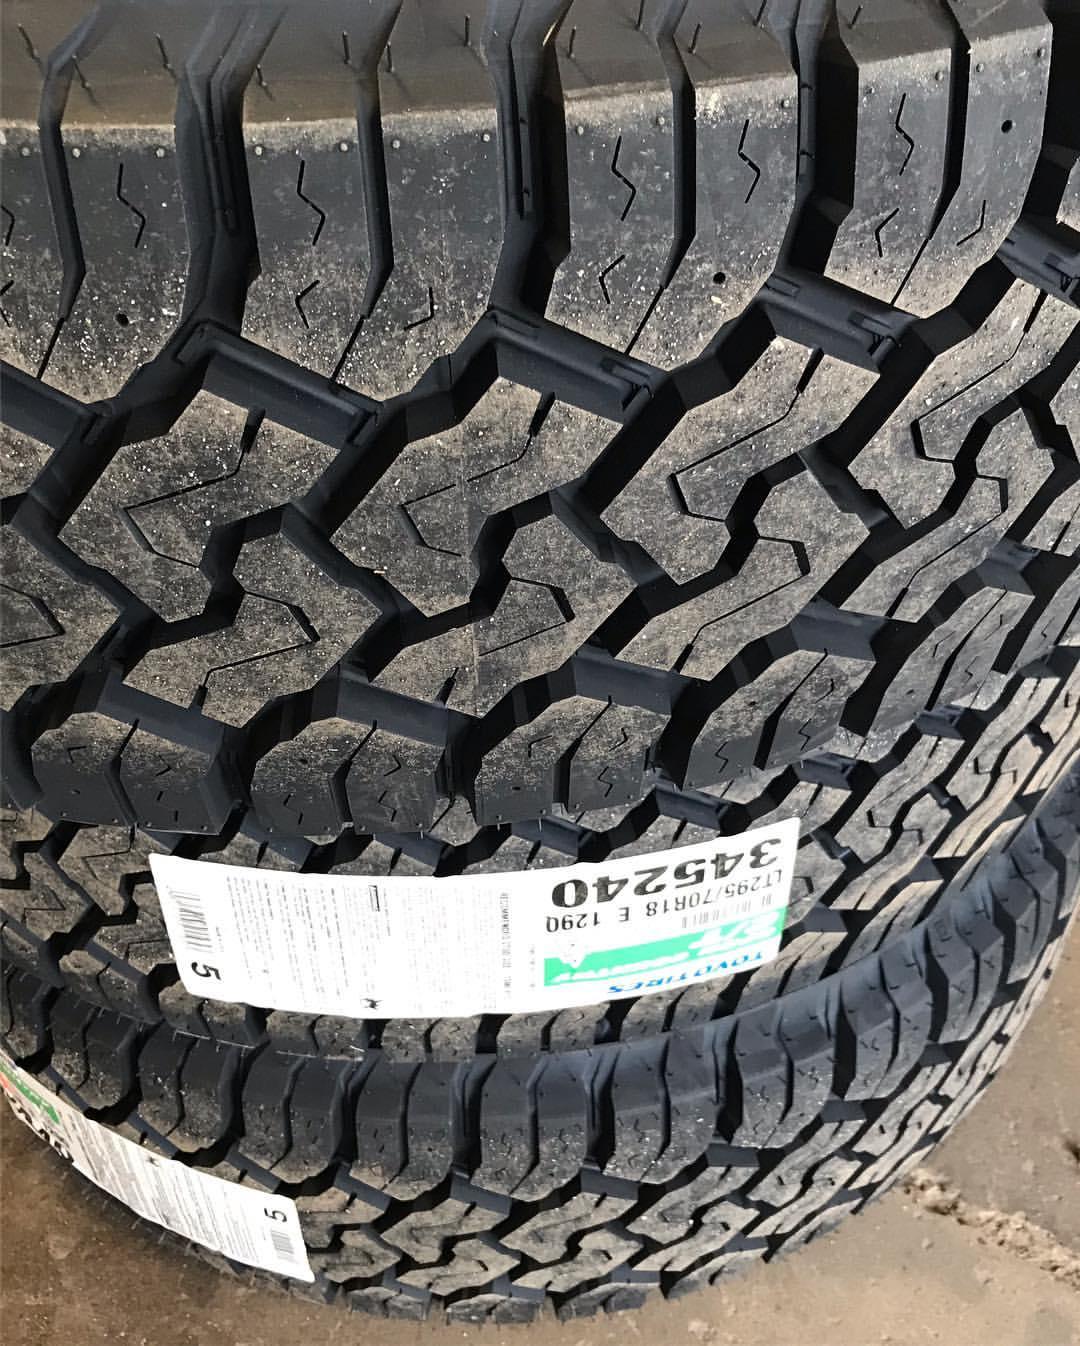 2016 Chevrolet 3500 Tires - Good 2 Go Tirecraft Auto Centre